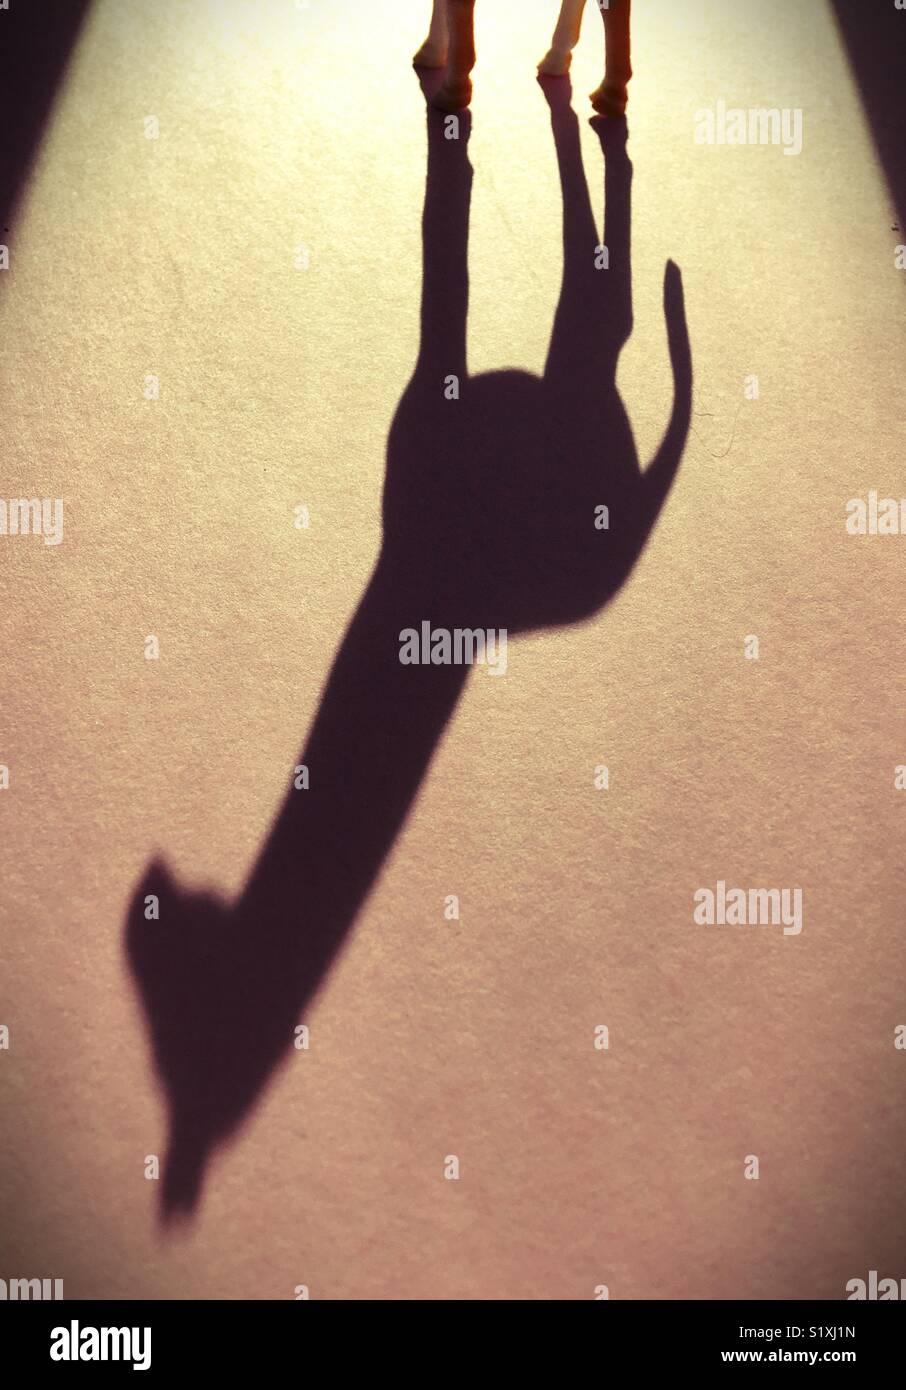 Shadow of giraffe toy. - Stock Image